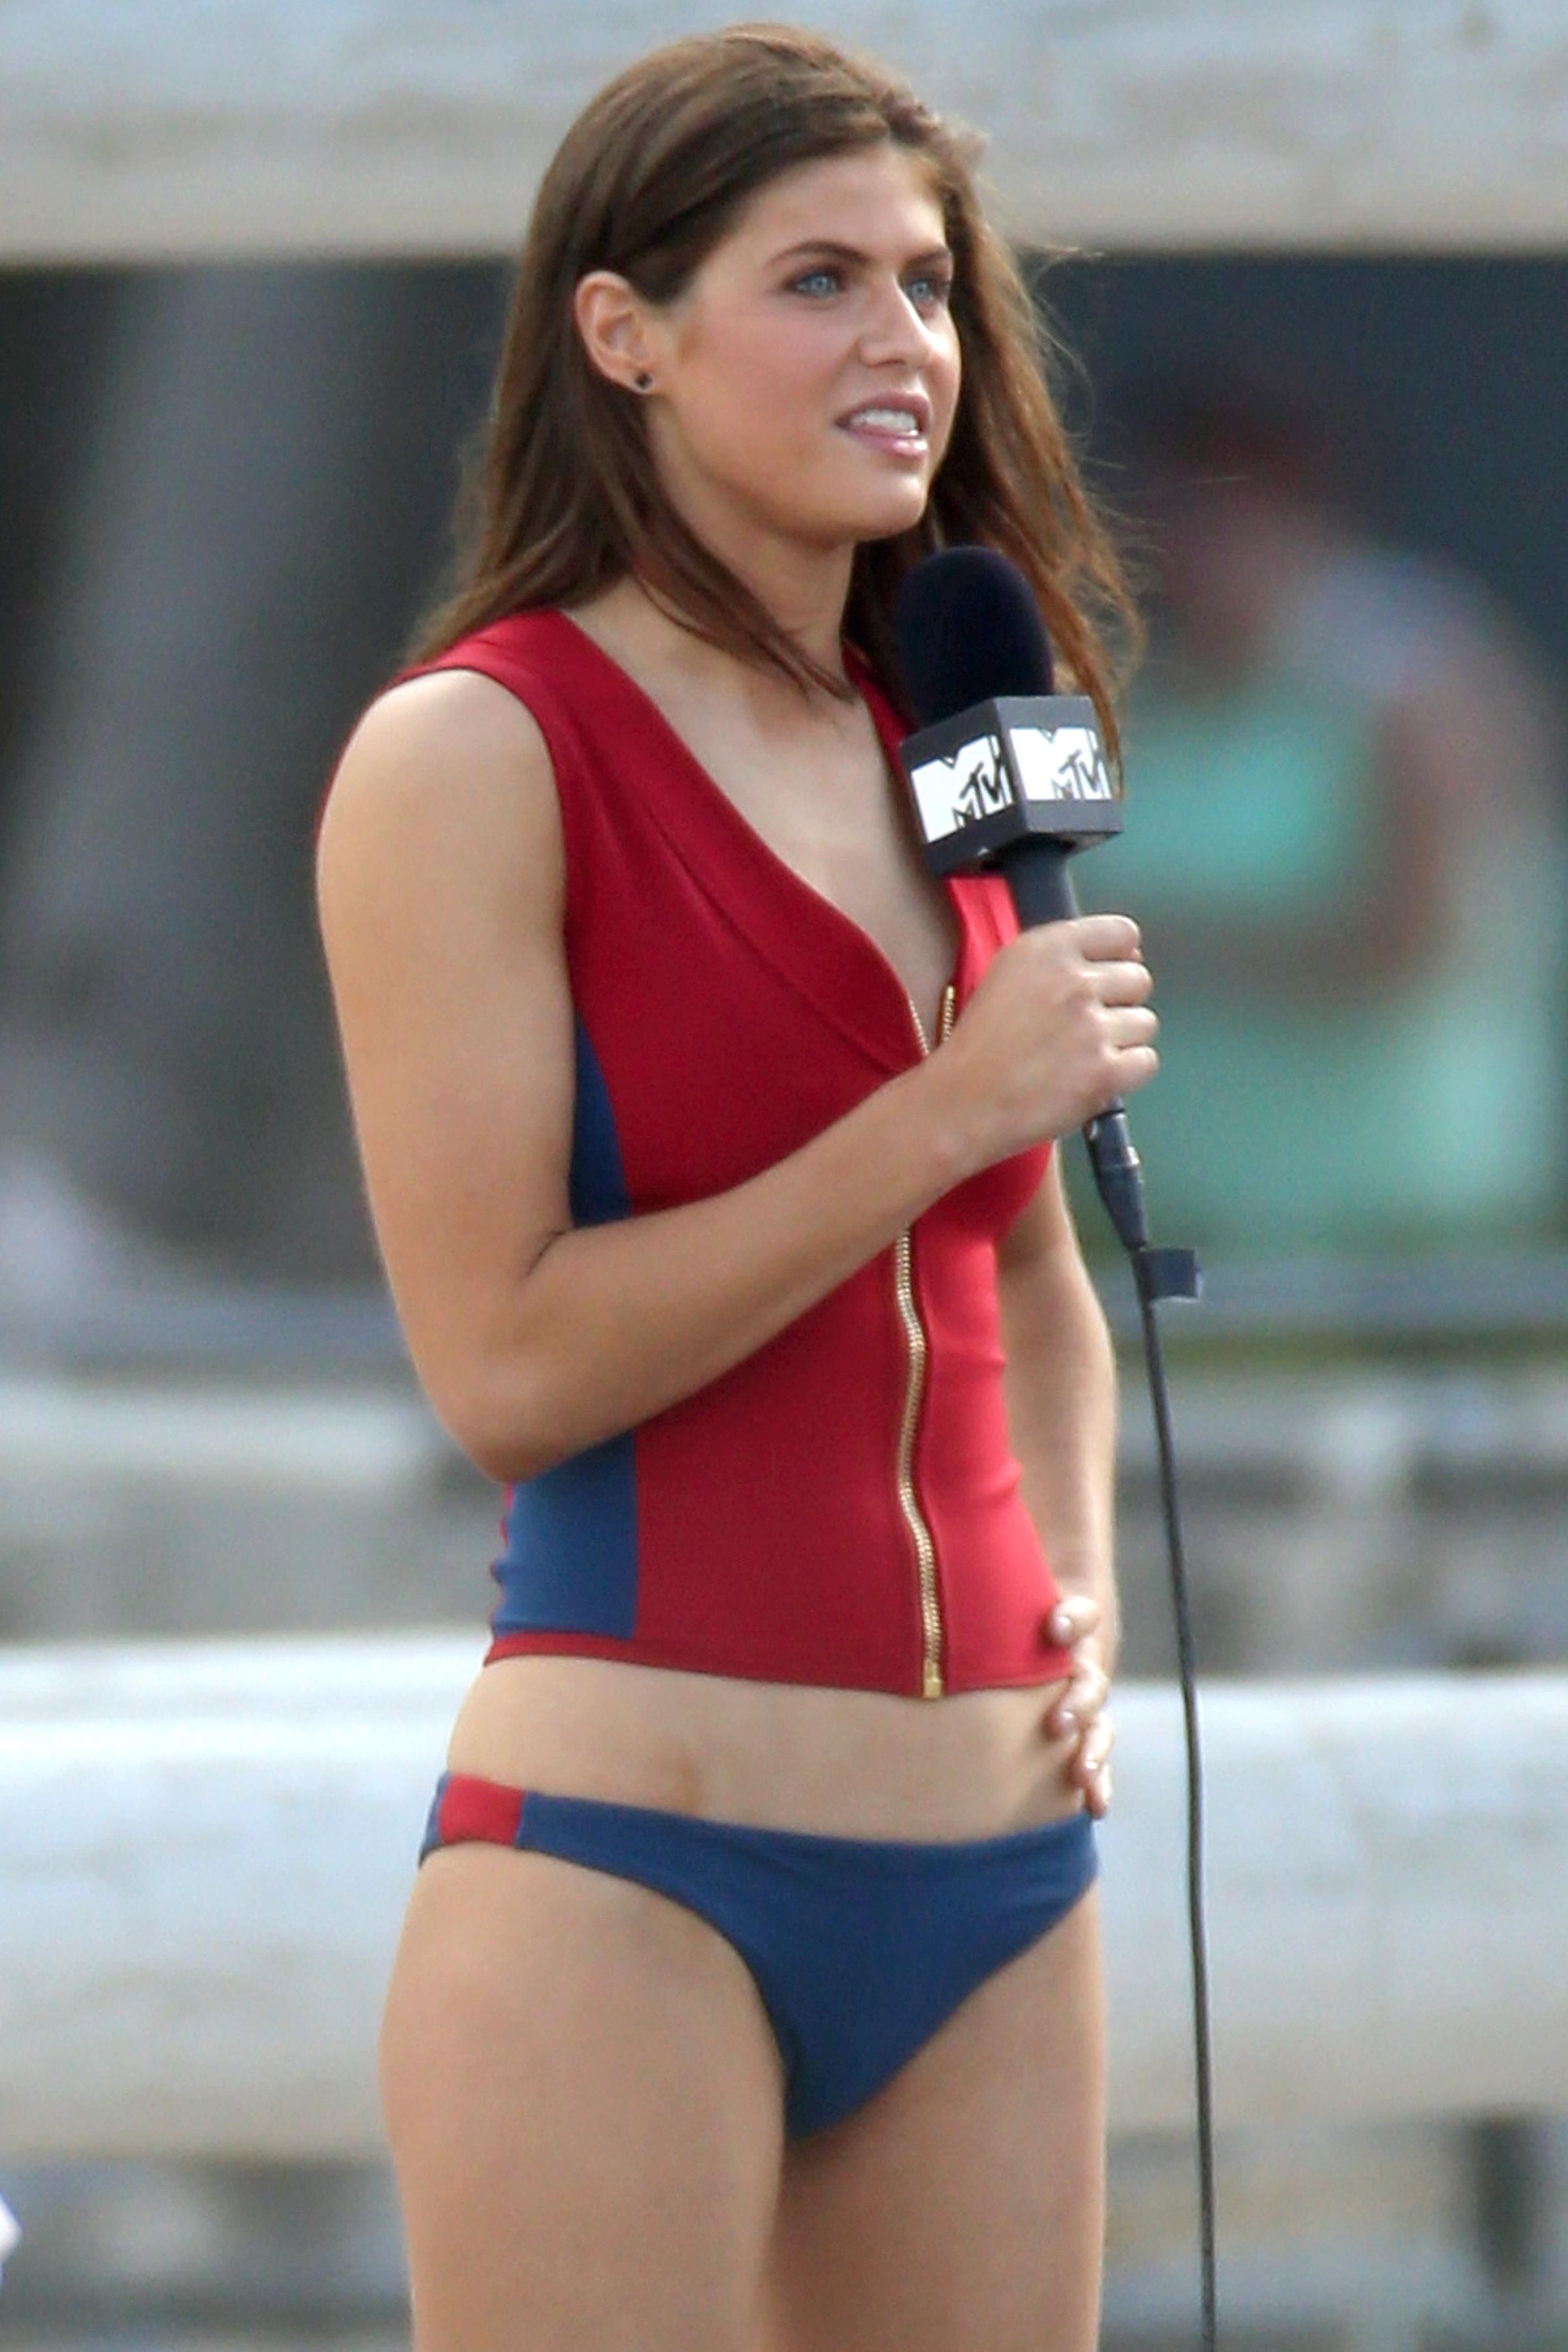 alexandra-daddario-bikini-bottom-on-the-set-of-baywatch ...